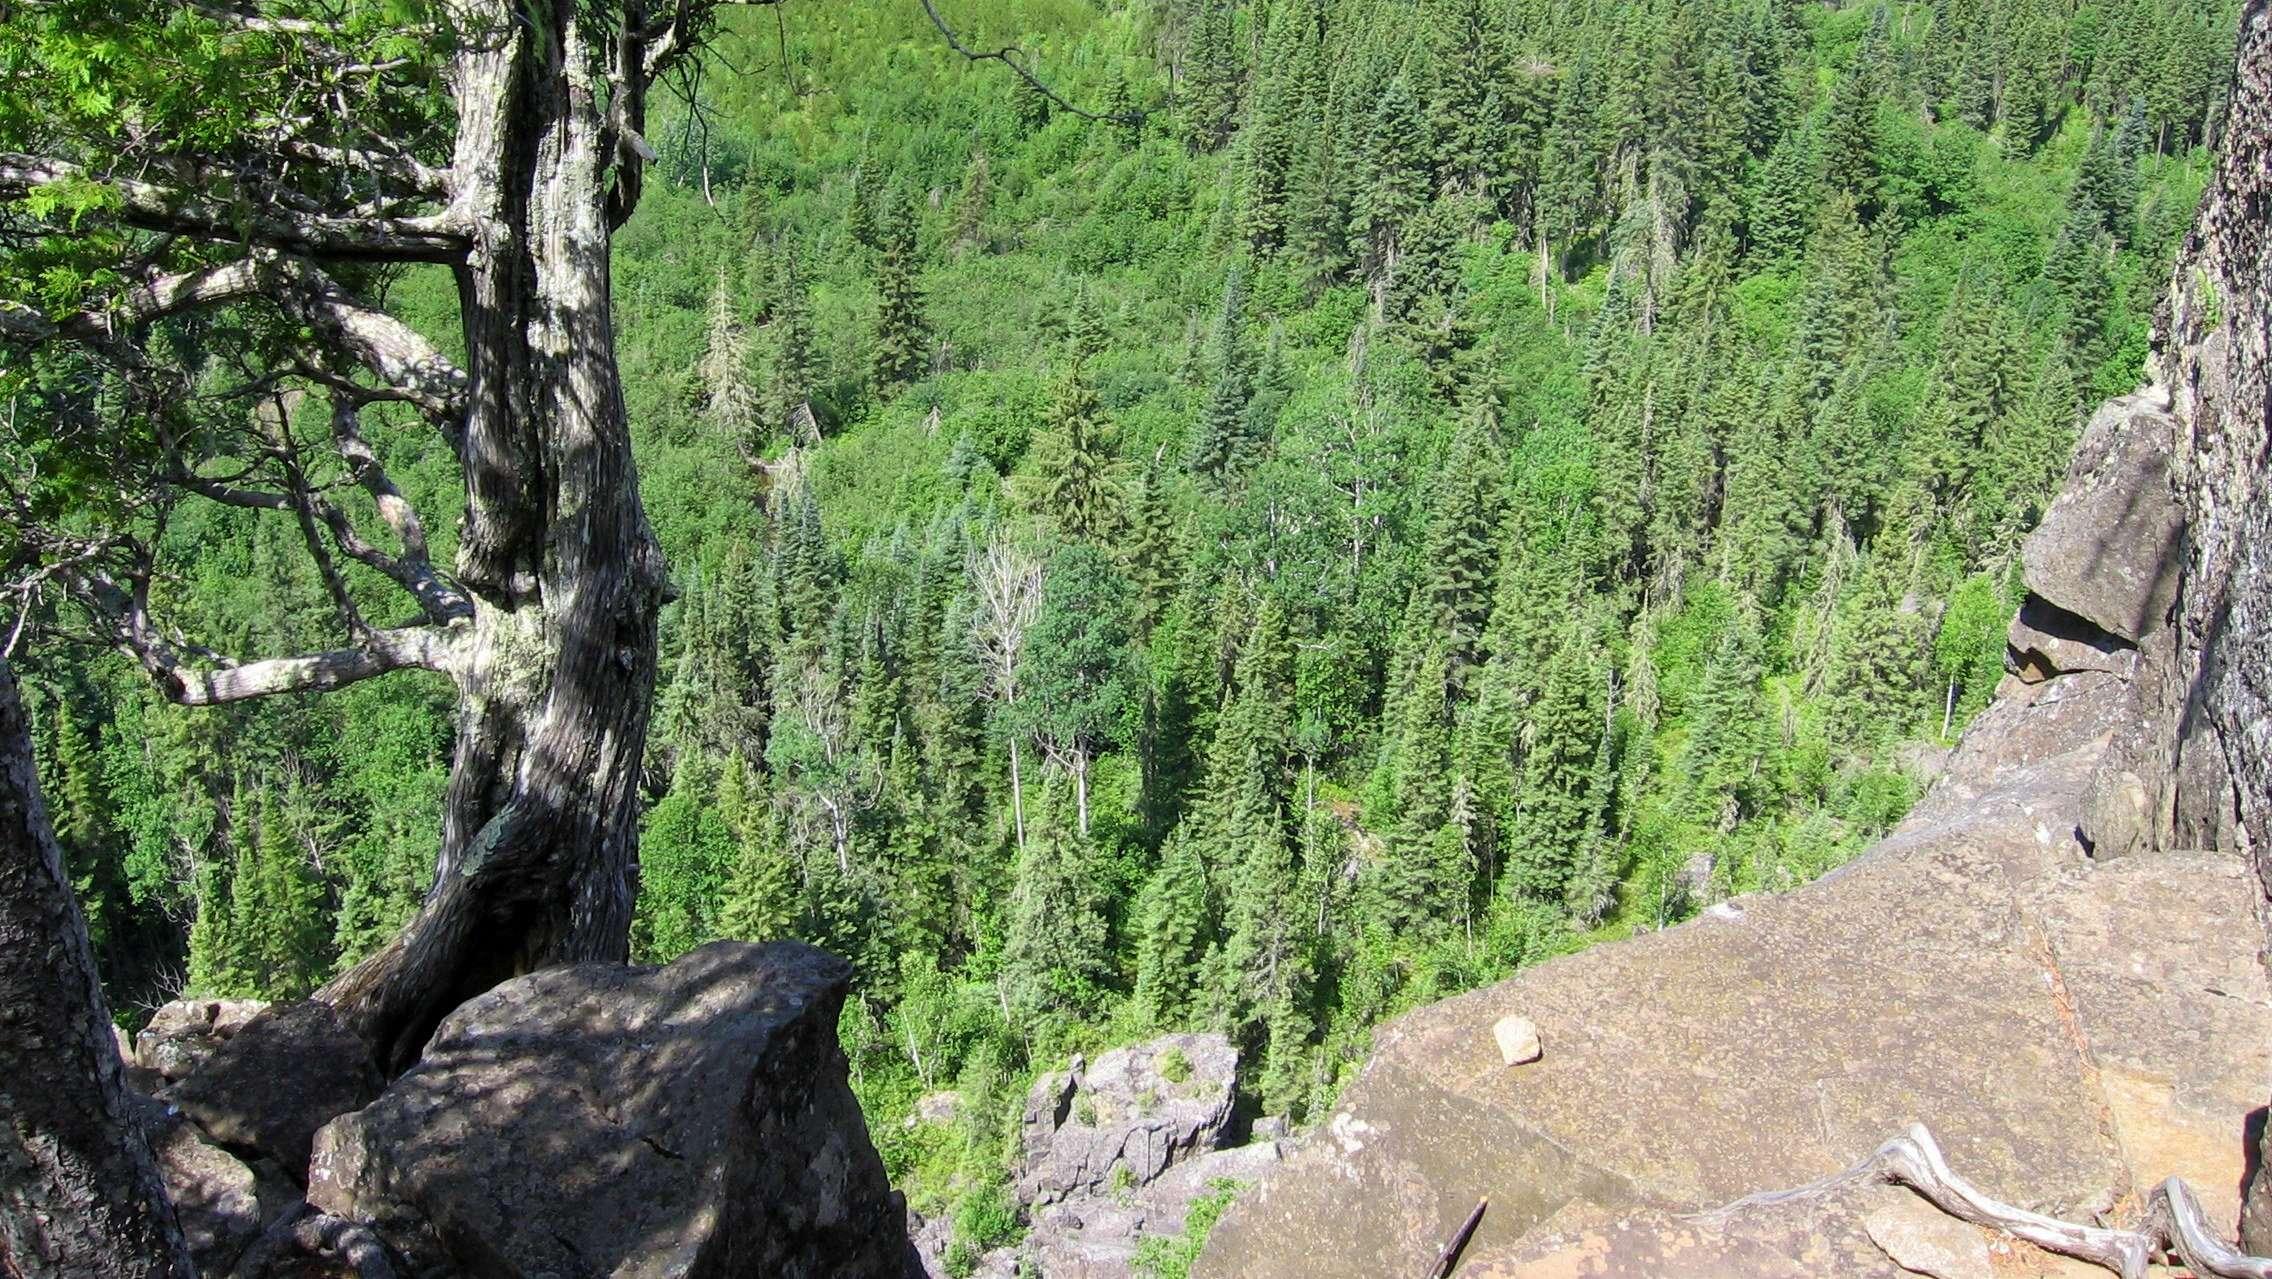 Claghorn Observer Rock Trail